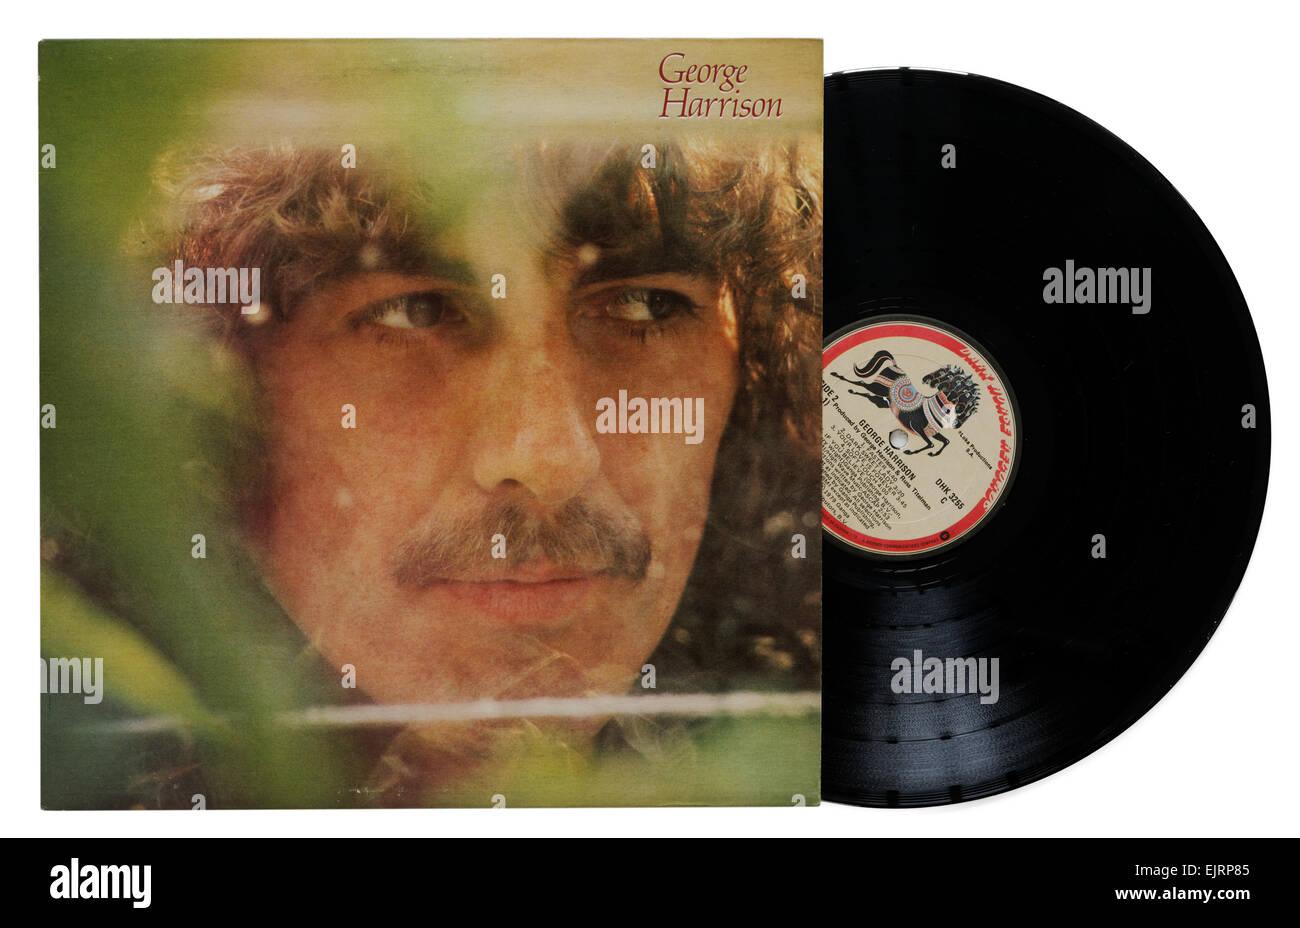 George Harrison album - Stock Image